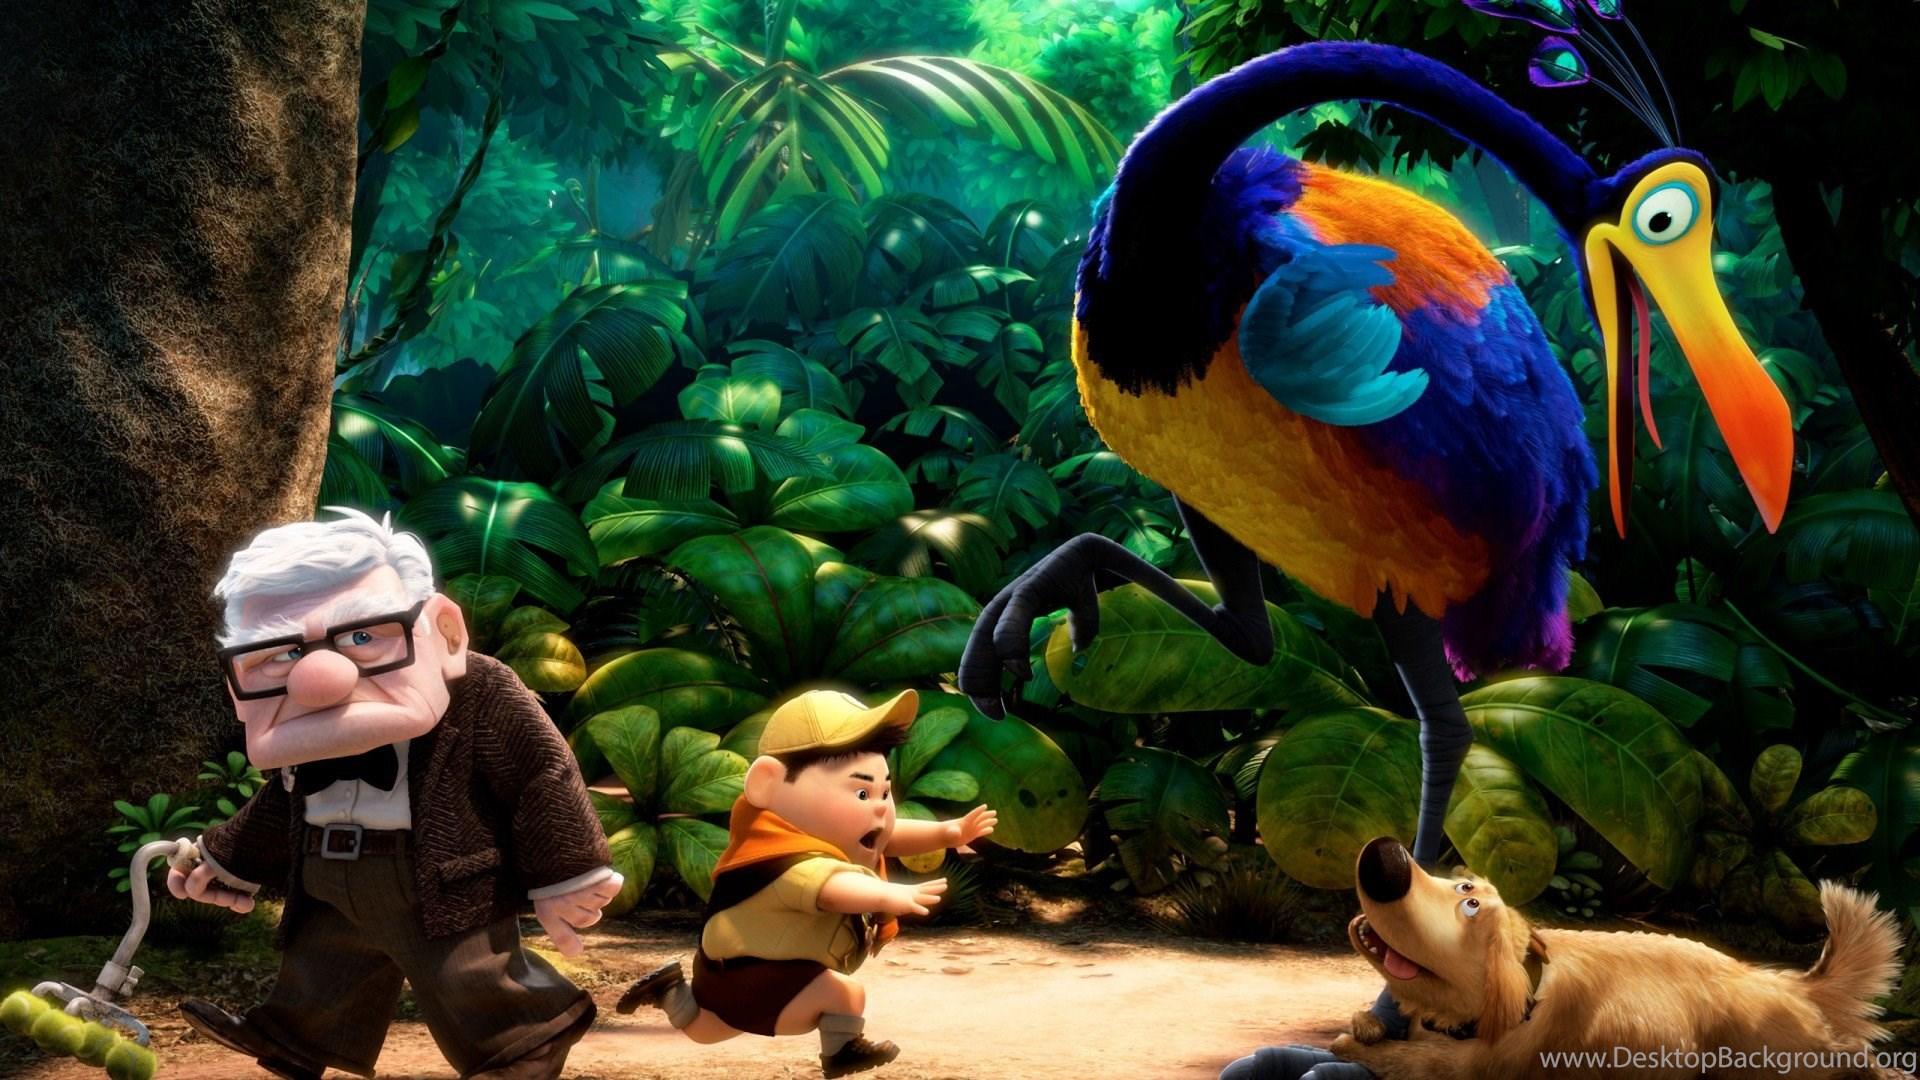 High Resolution Pixar Up Wallpapers Hd 1080p Full Size Desktop